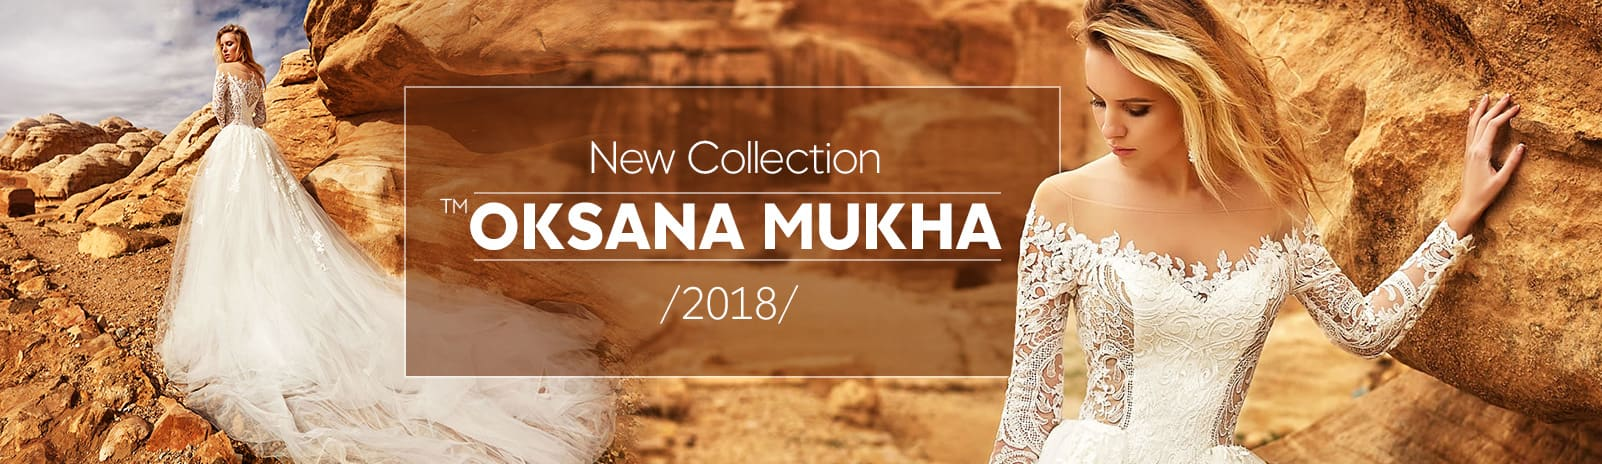 oksana-mukha-2018